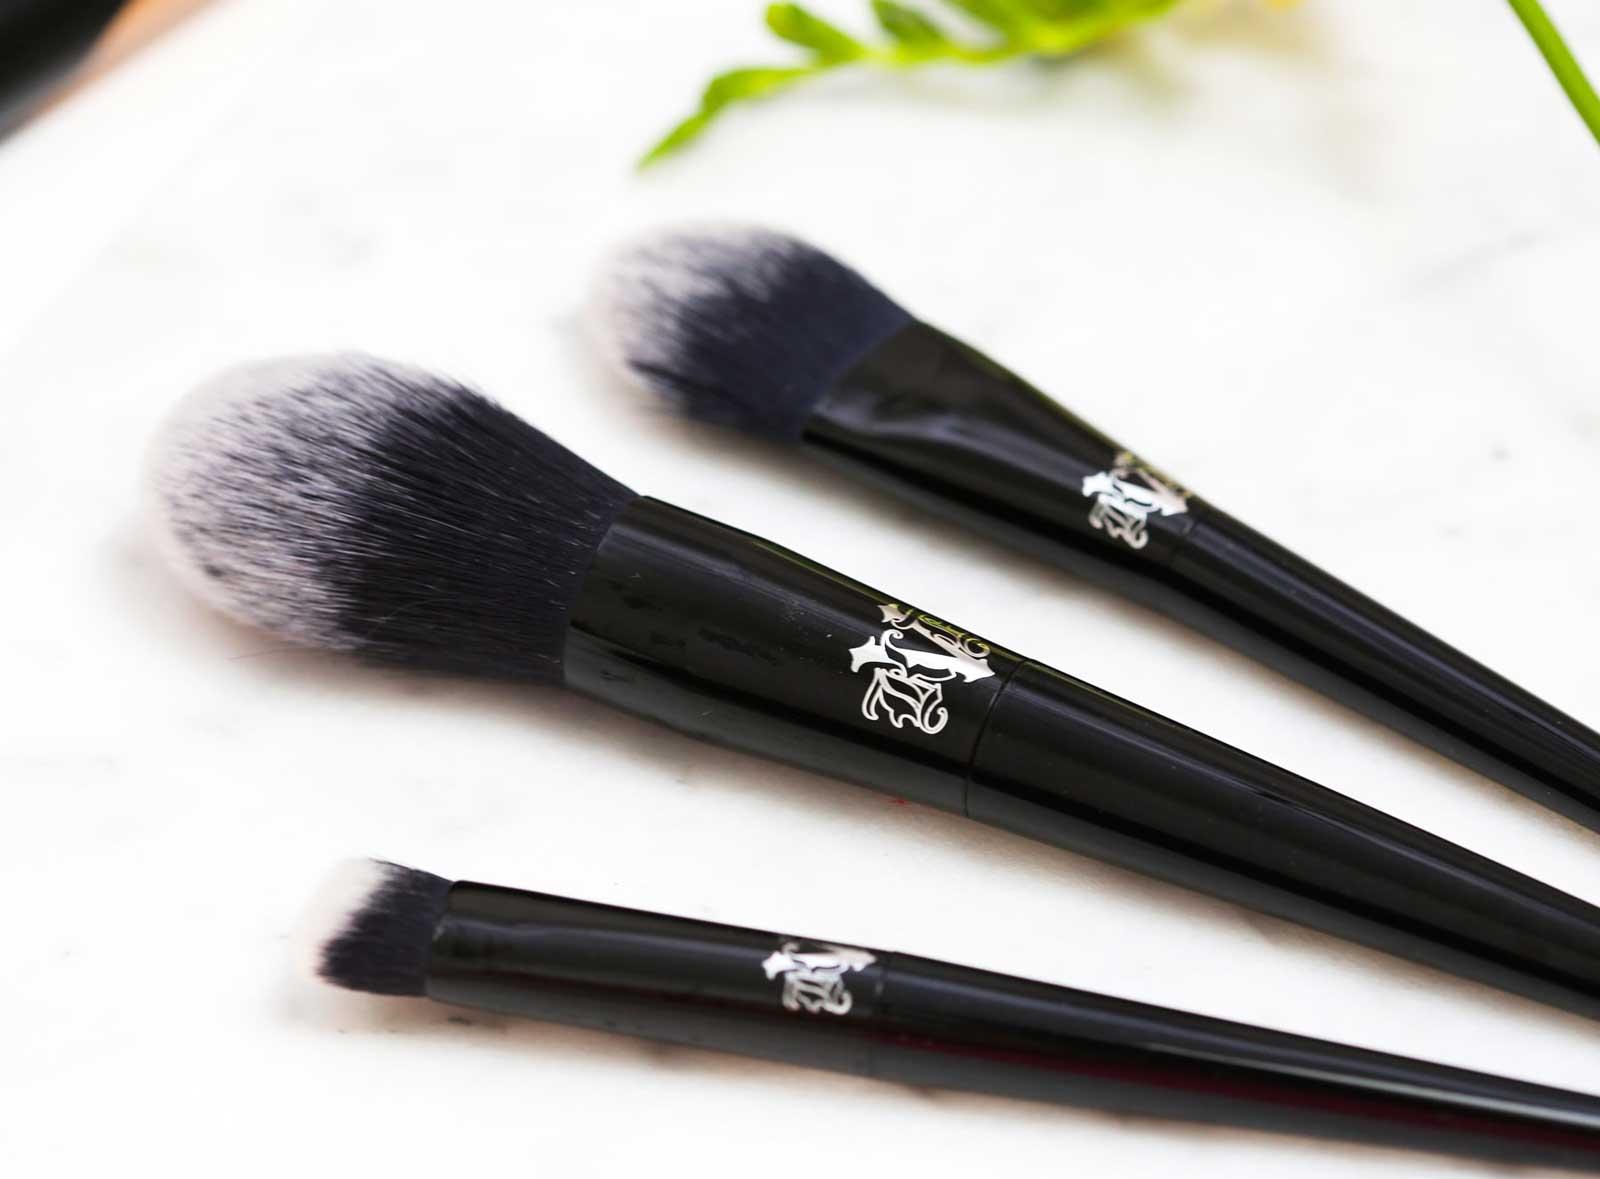 Best Cruelty-Free Makeup Brushes